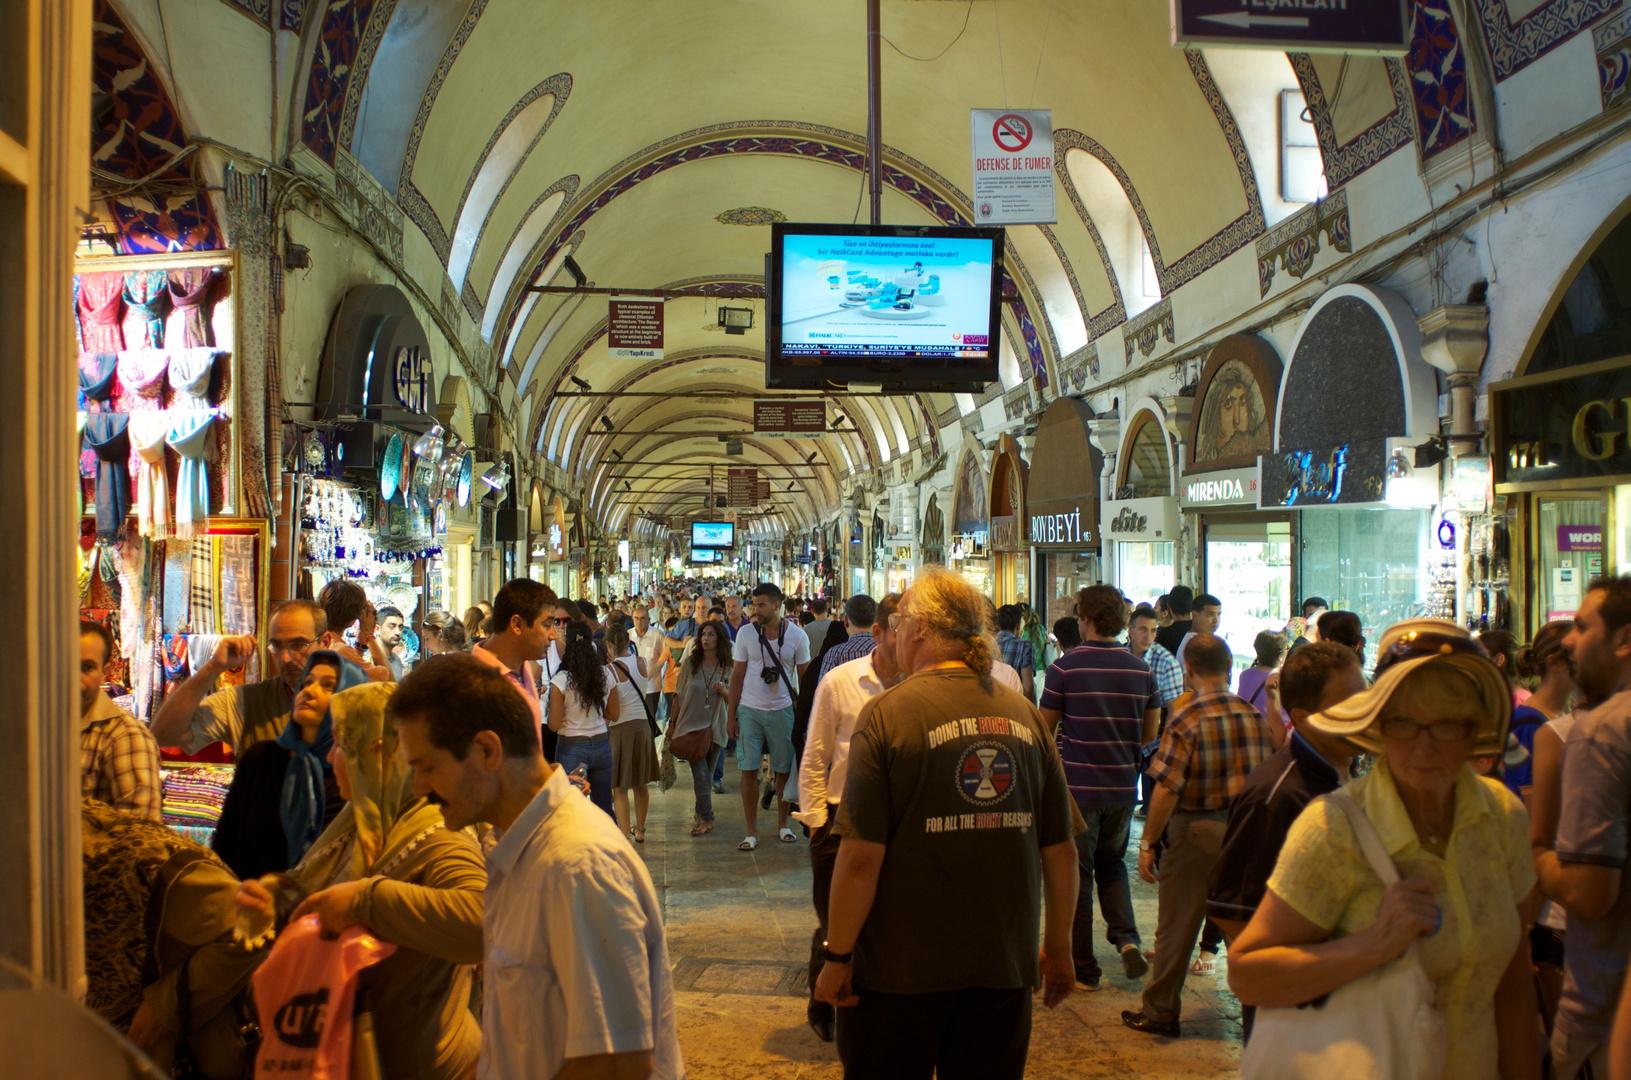 Der grosse basar in istanbul 2012